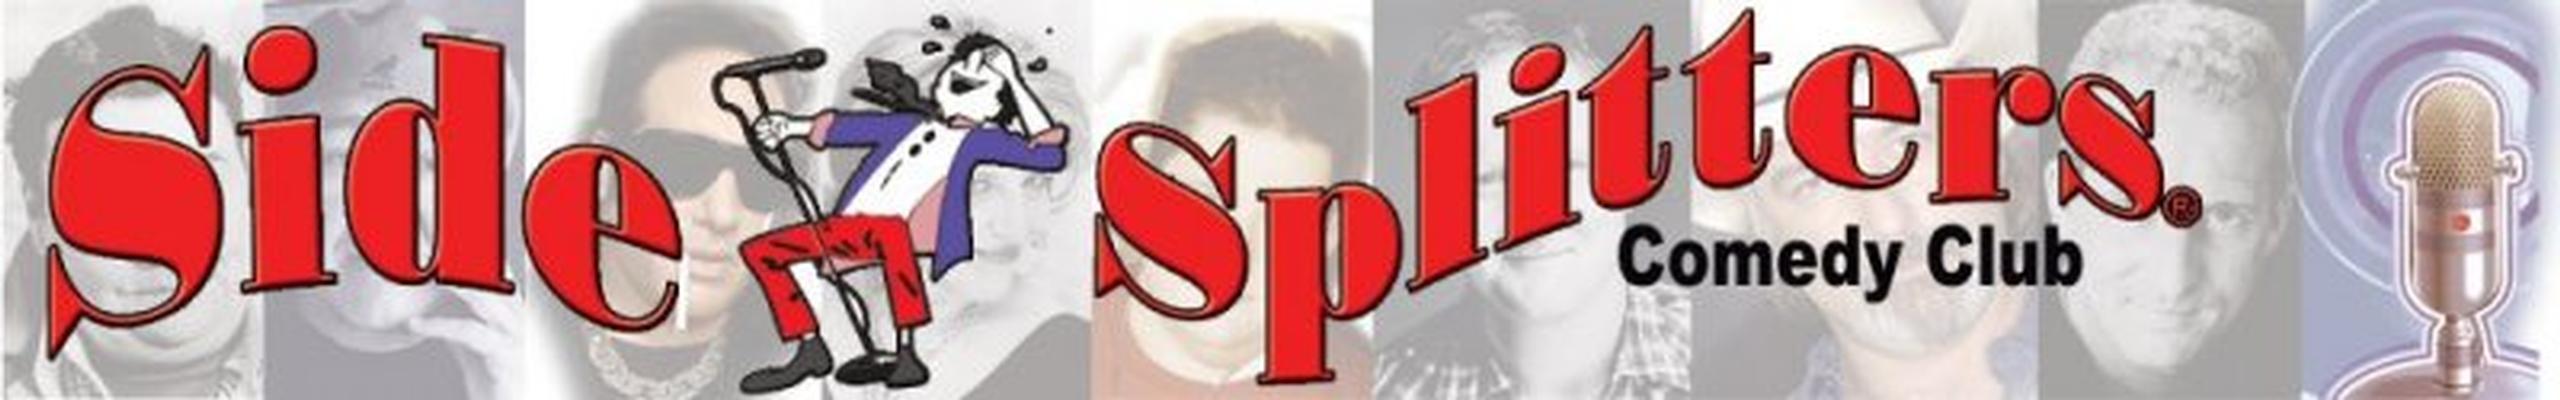 Side Splitters Comedy Club Tampa